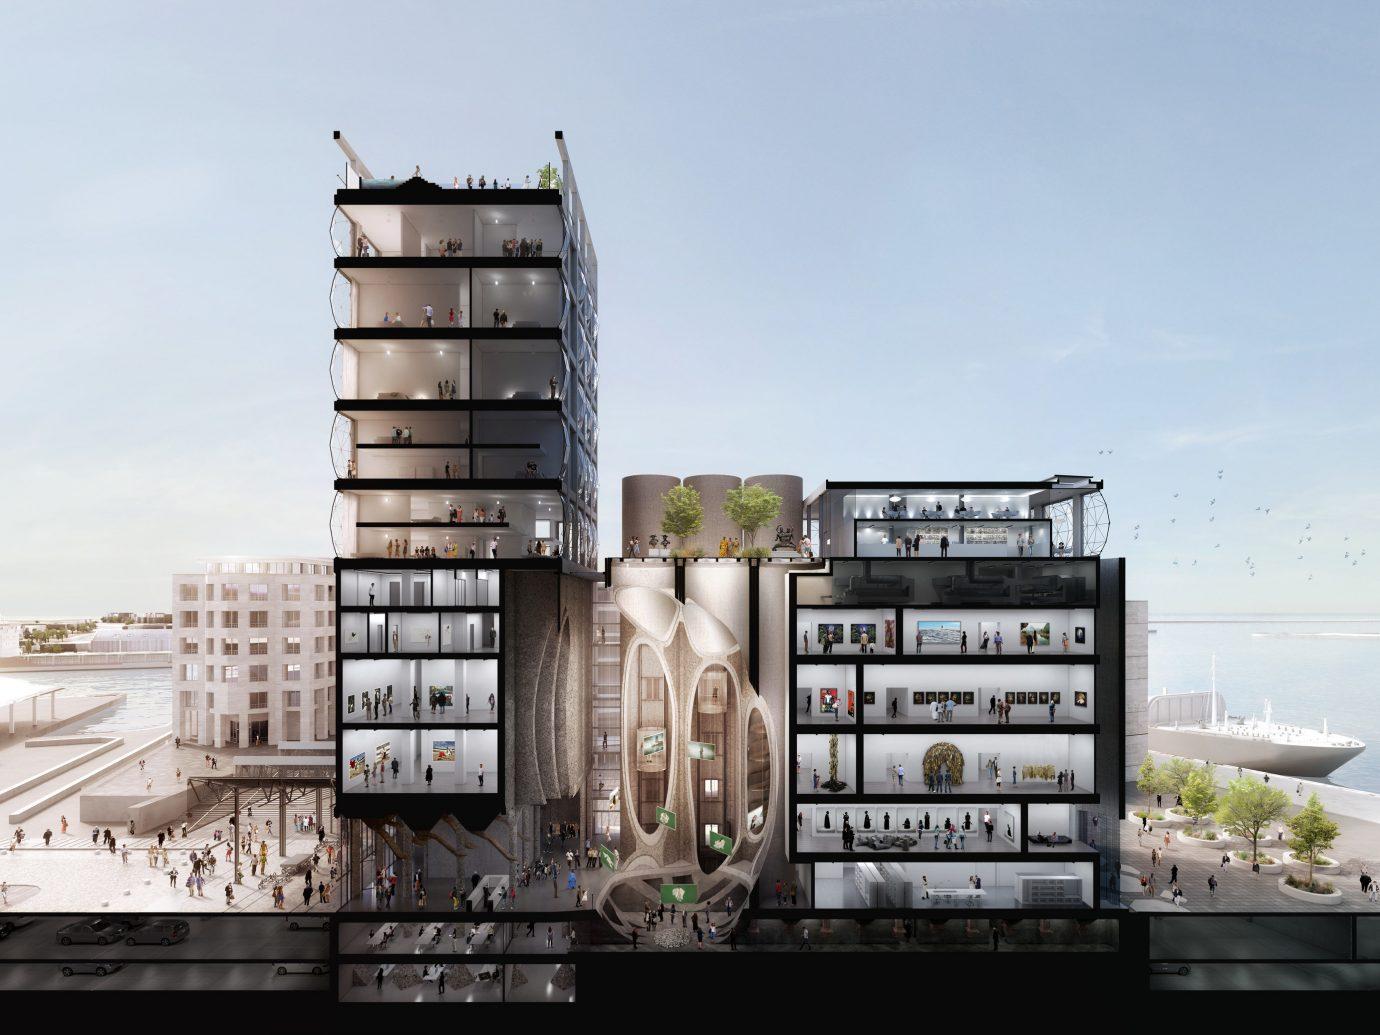 Hotels sky tower block condominium outdoor property residential area Architecture facade screenshot skyscraper